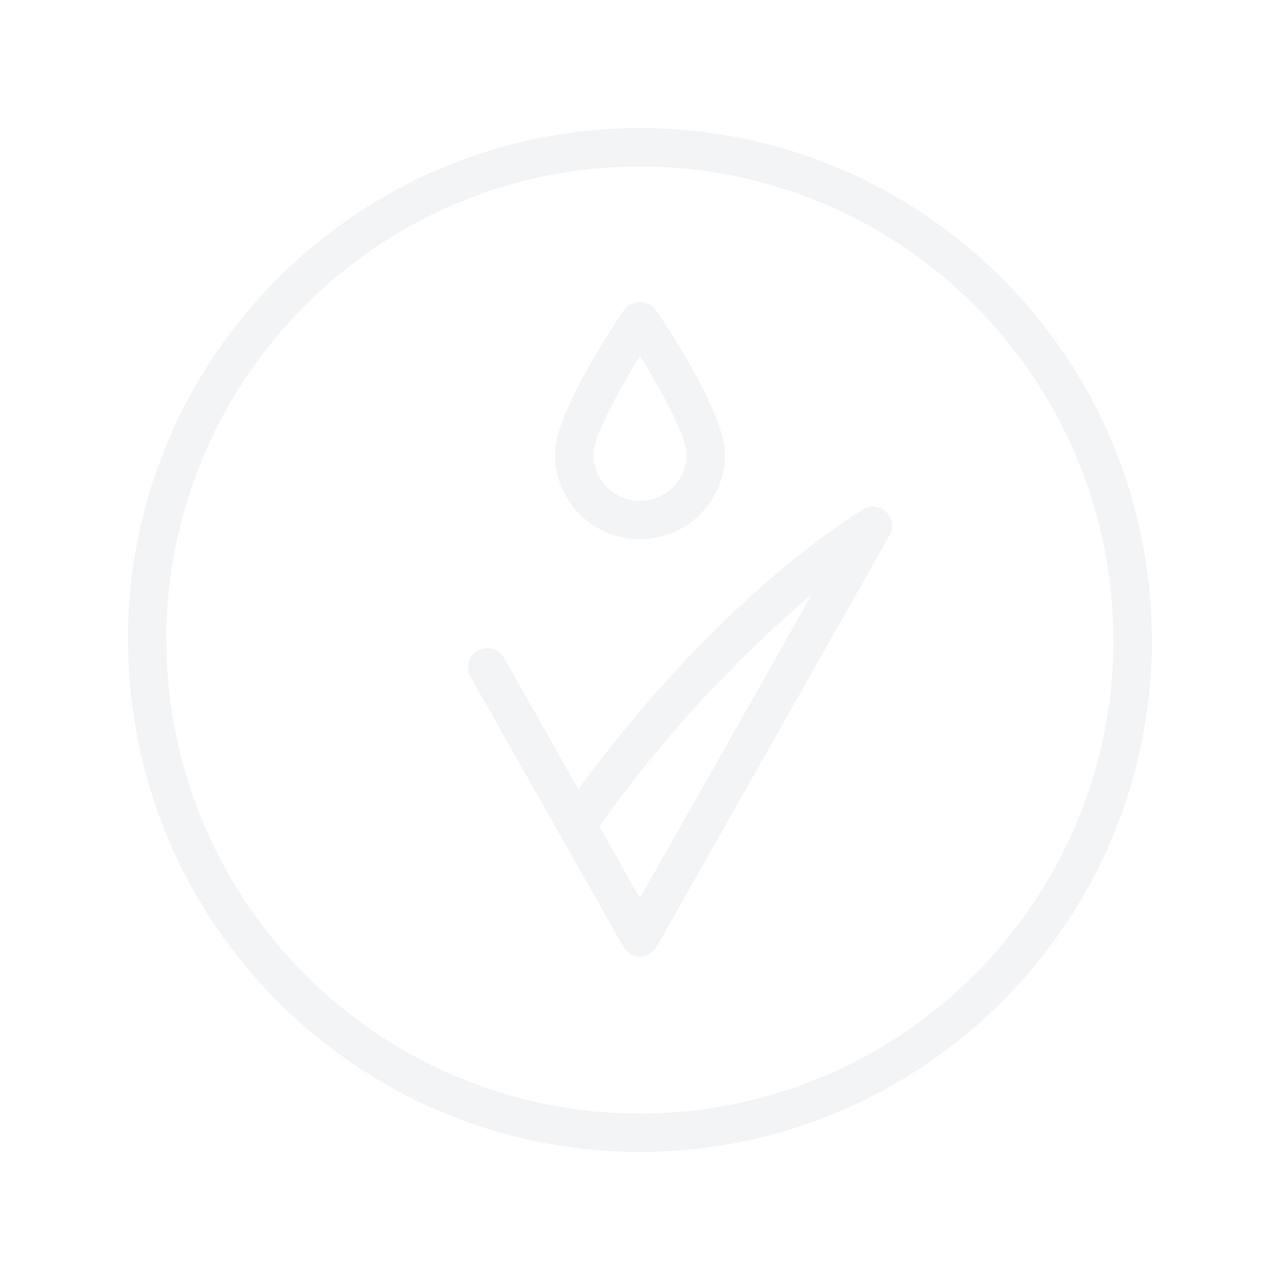 BIOKAP Nutricolor 3.0 Dark Brown Permanent Hair Dye 140ml